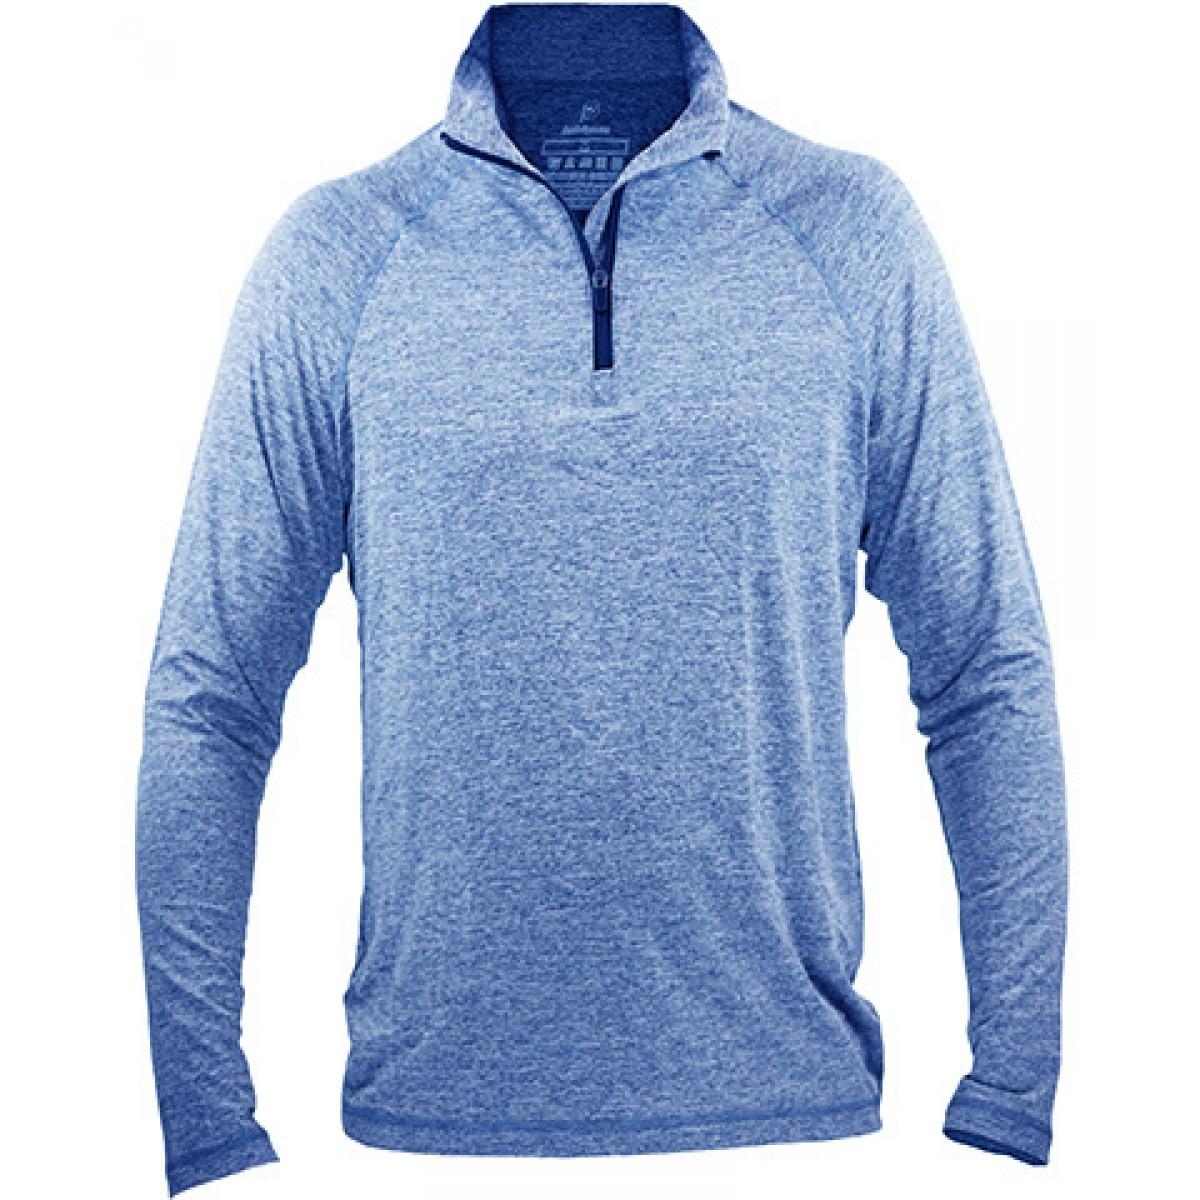 Fine Designs Blend 1/4-Zip Pullover-Blue-XL